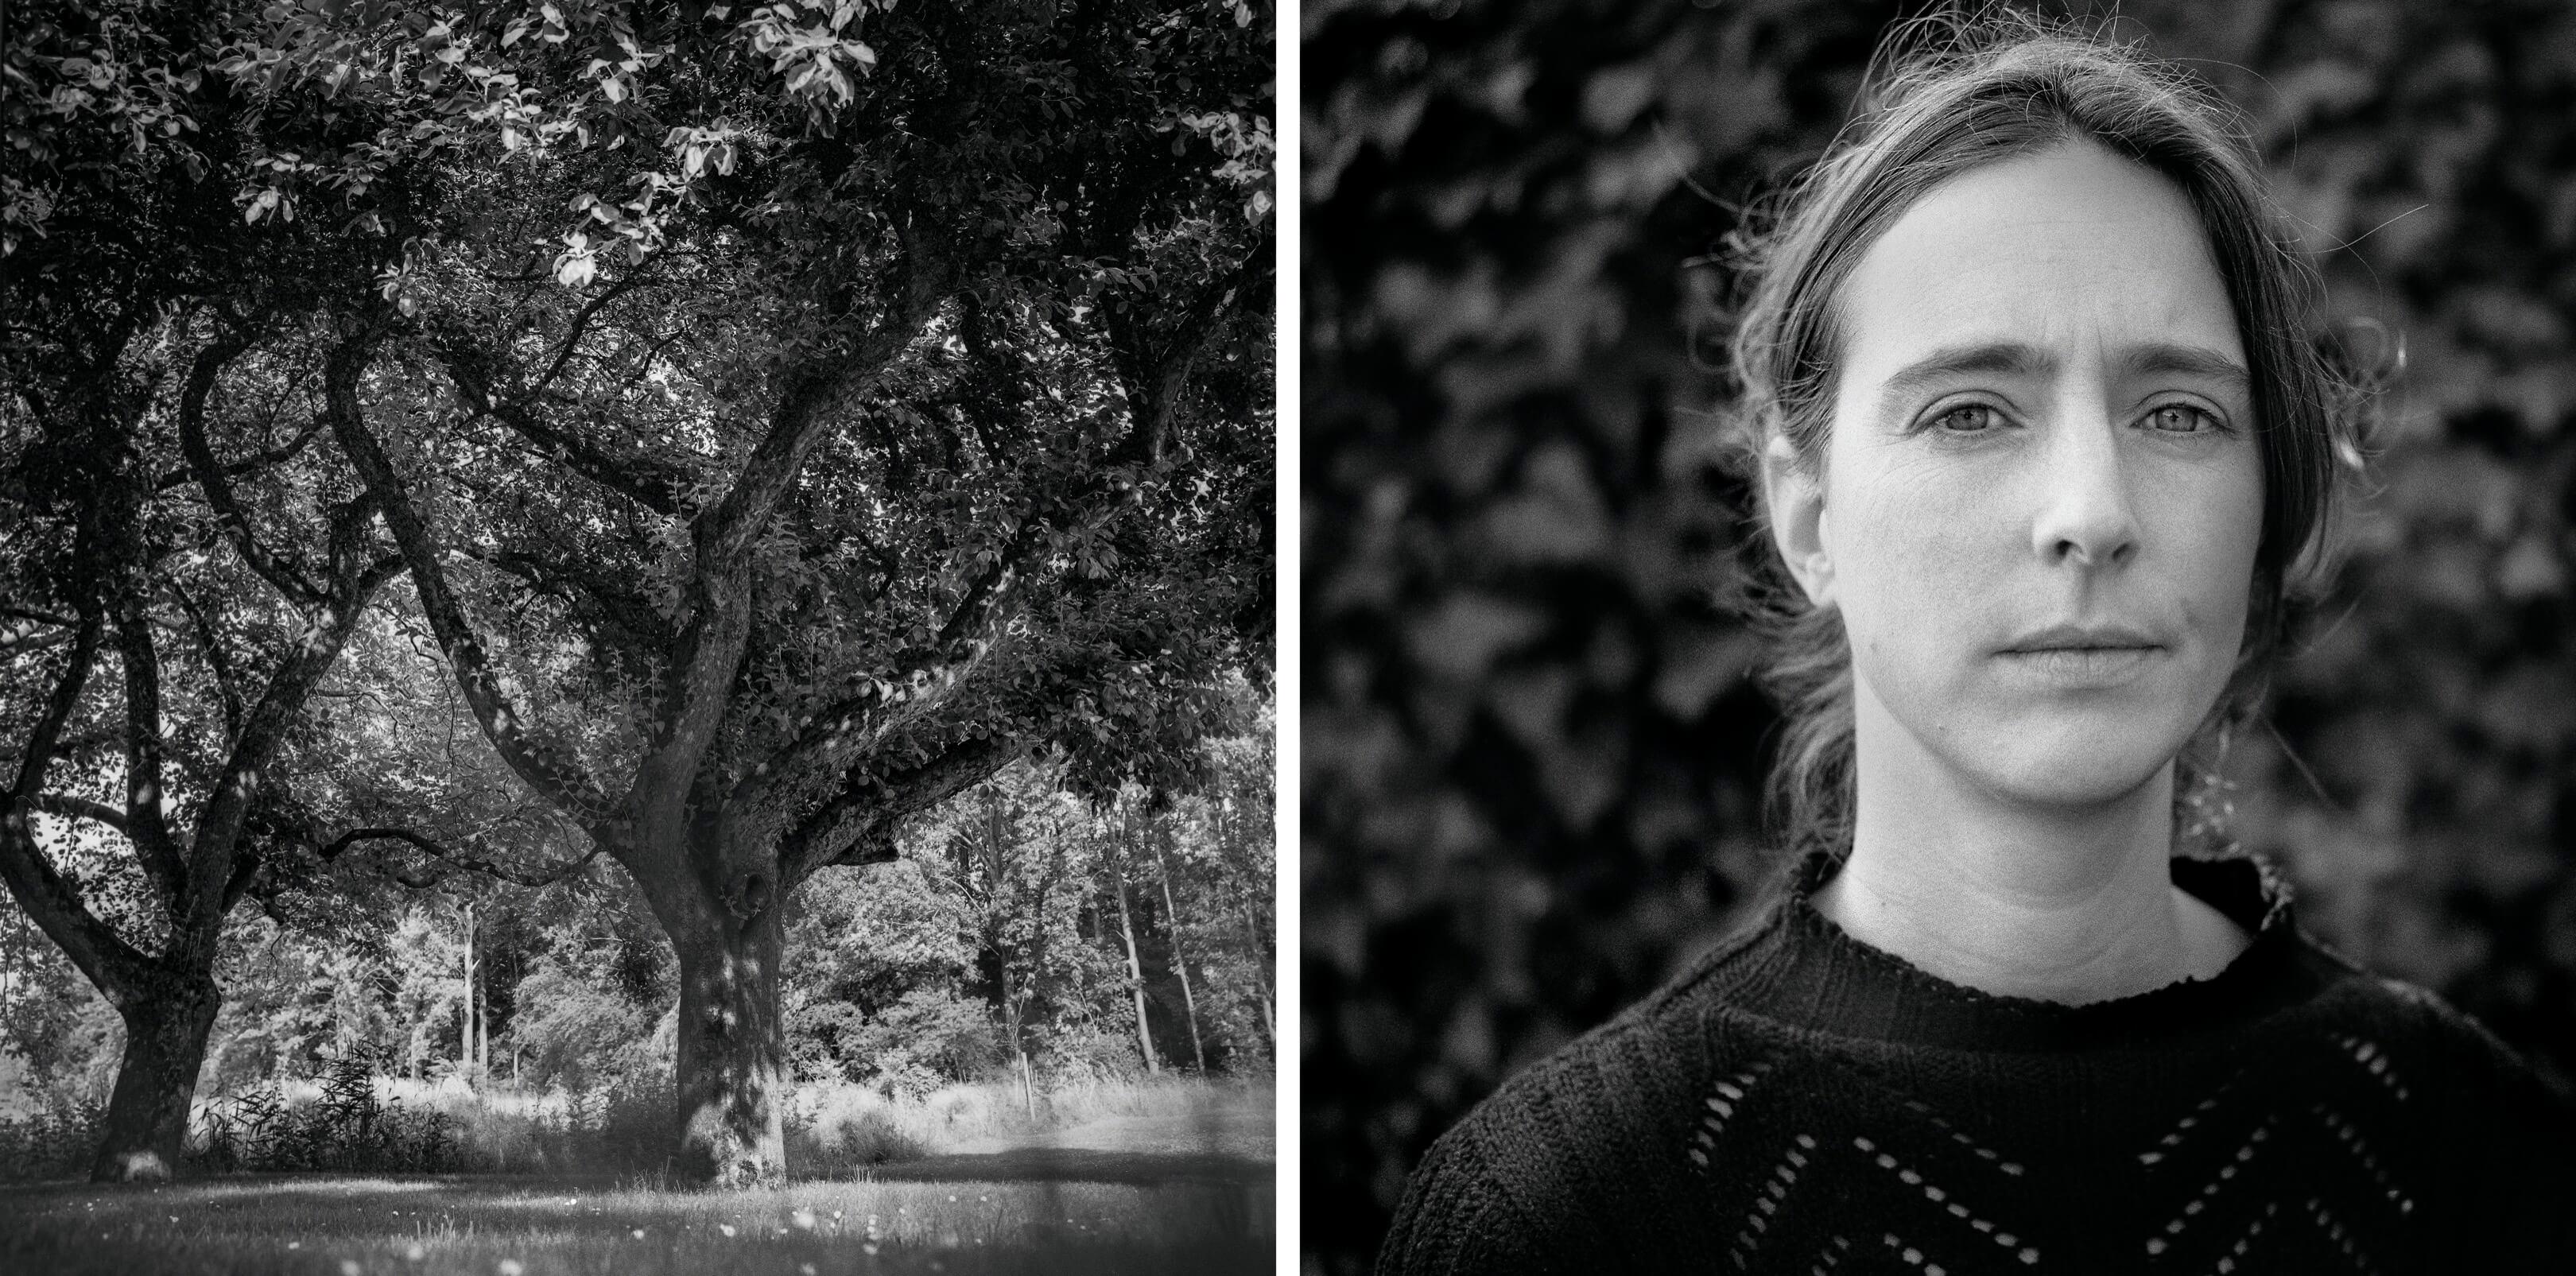 Jurjen Poeles Fotografie Jur portret landschap fragment adempauze windstil staren in de stilte ademloos zwart wit zw kunst kunstfotografie Daphne